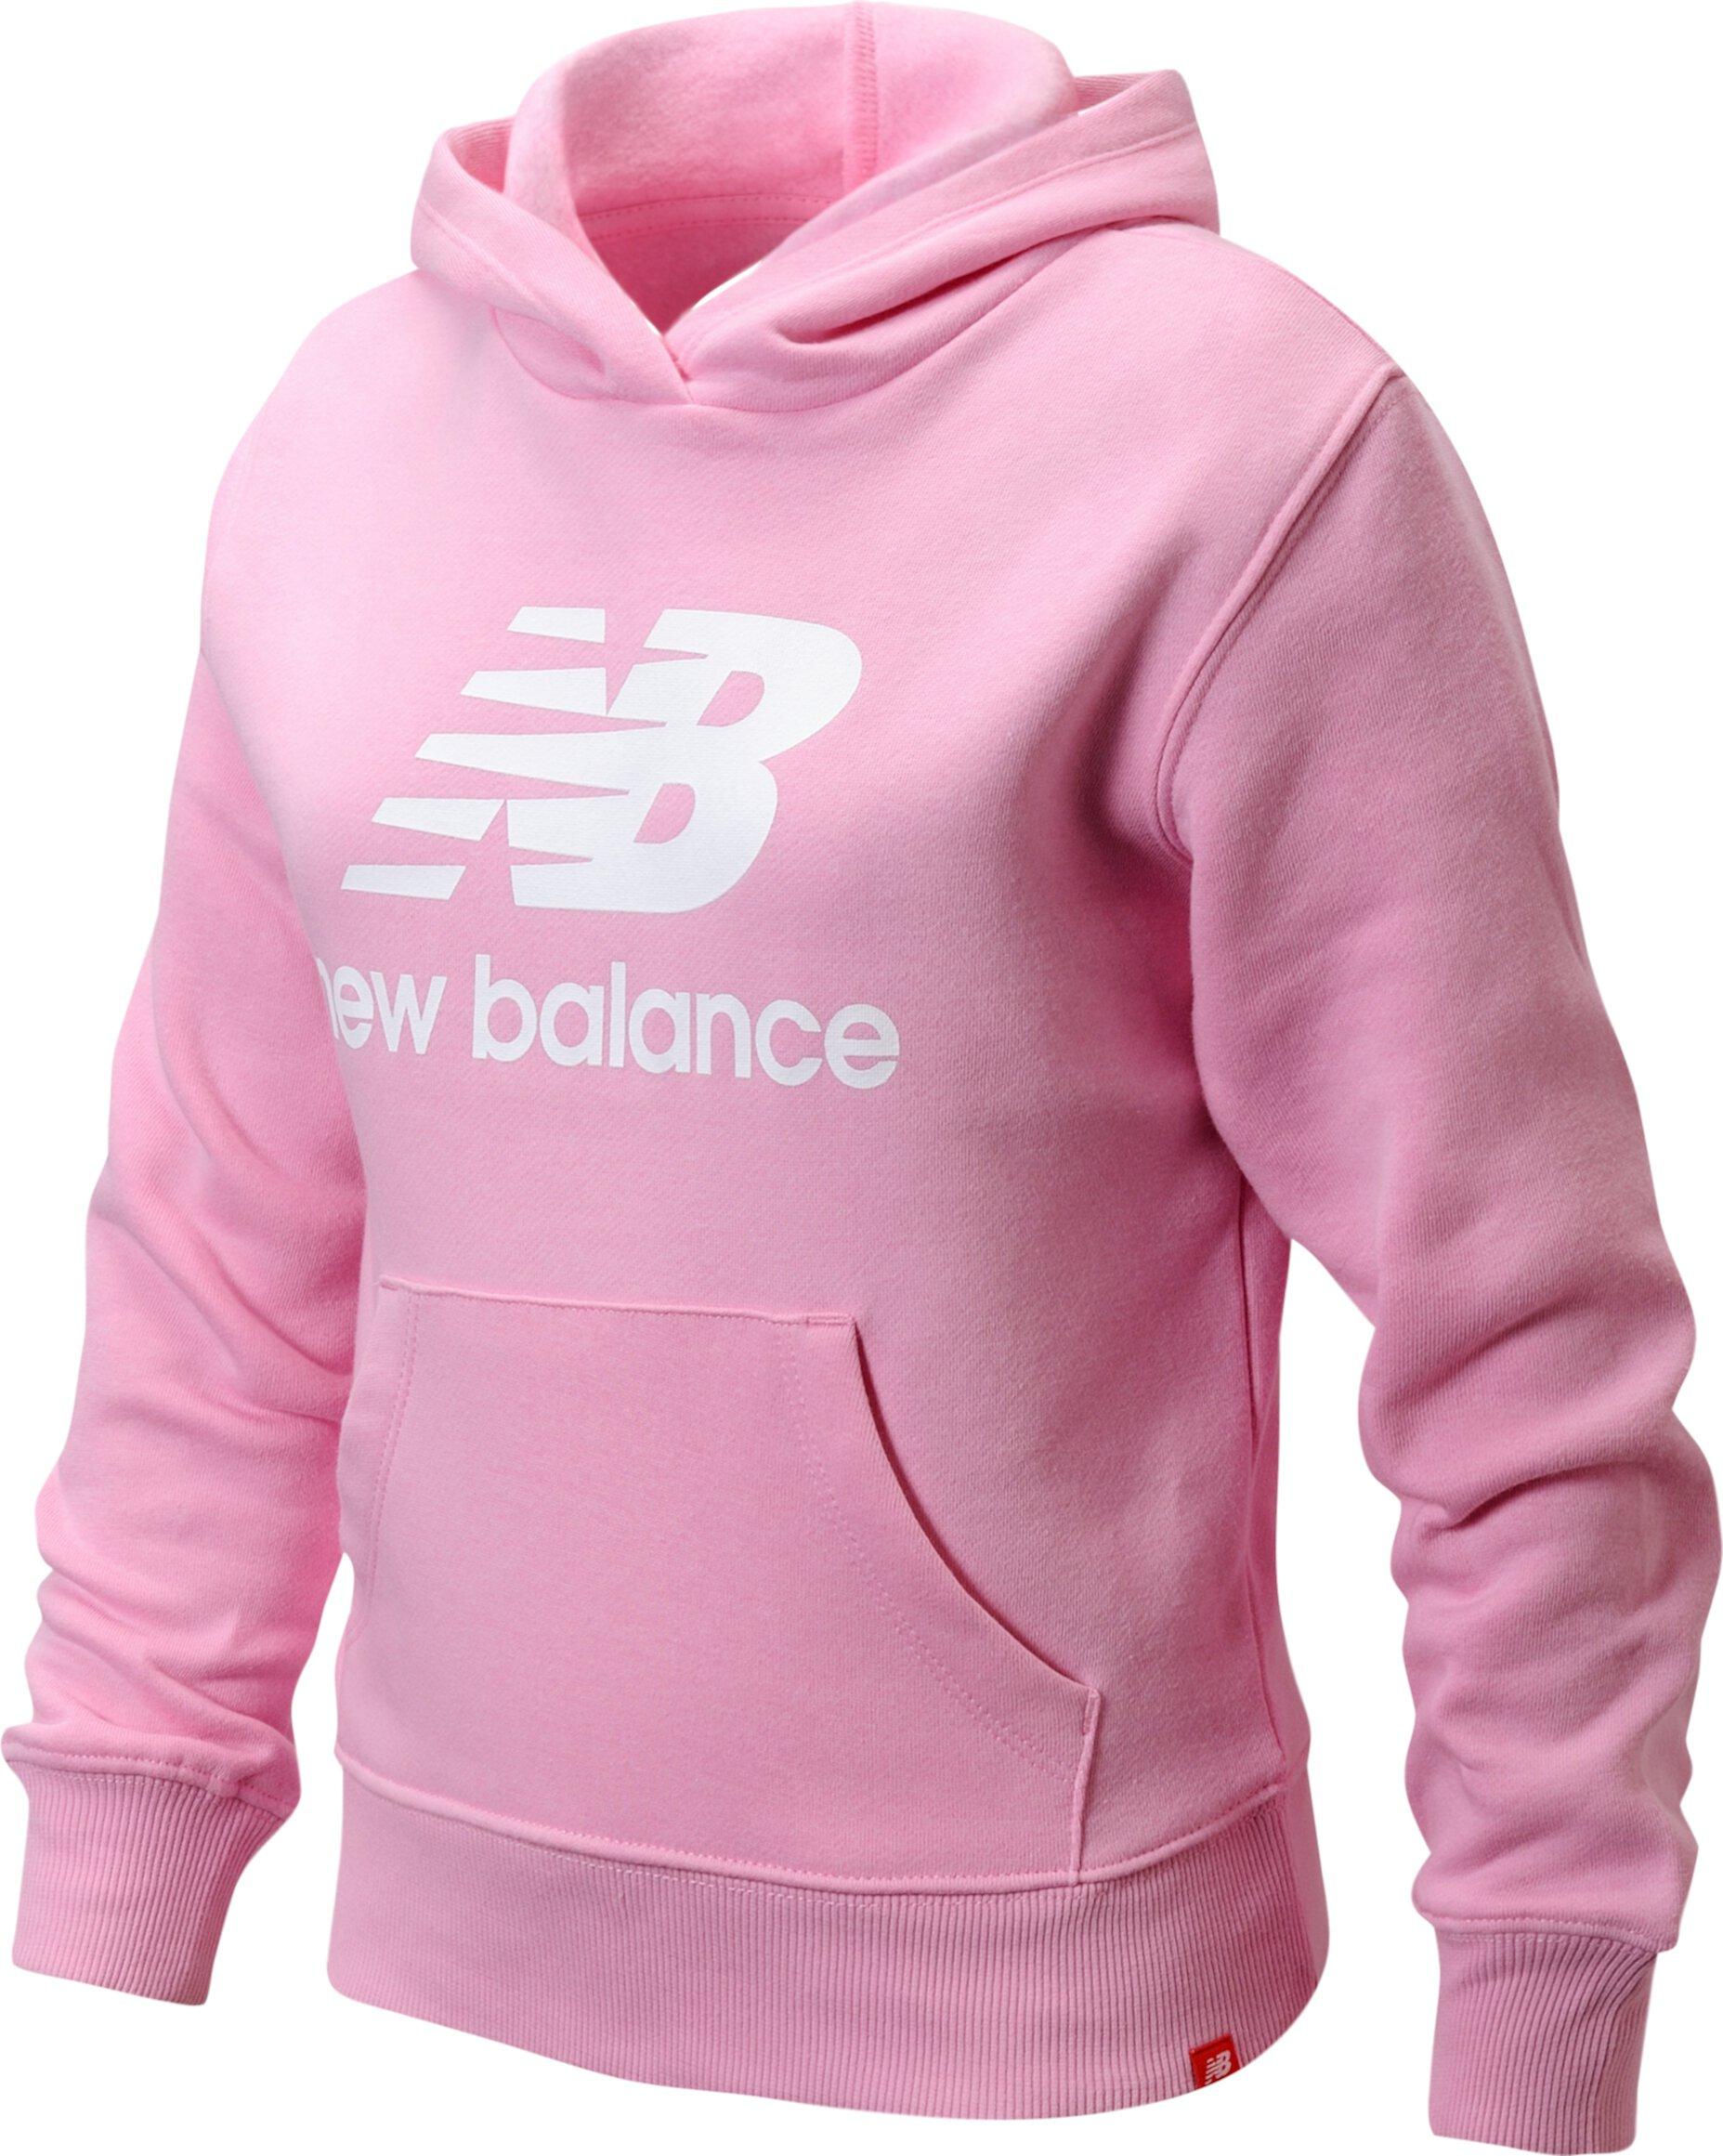 Толстовка с капюшоном Core Pullover (Big Kids) New Balance Kids